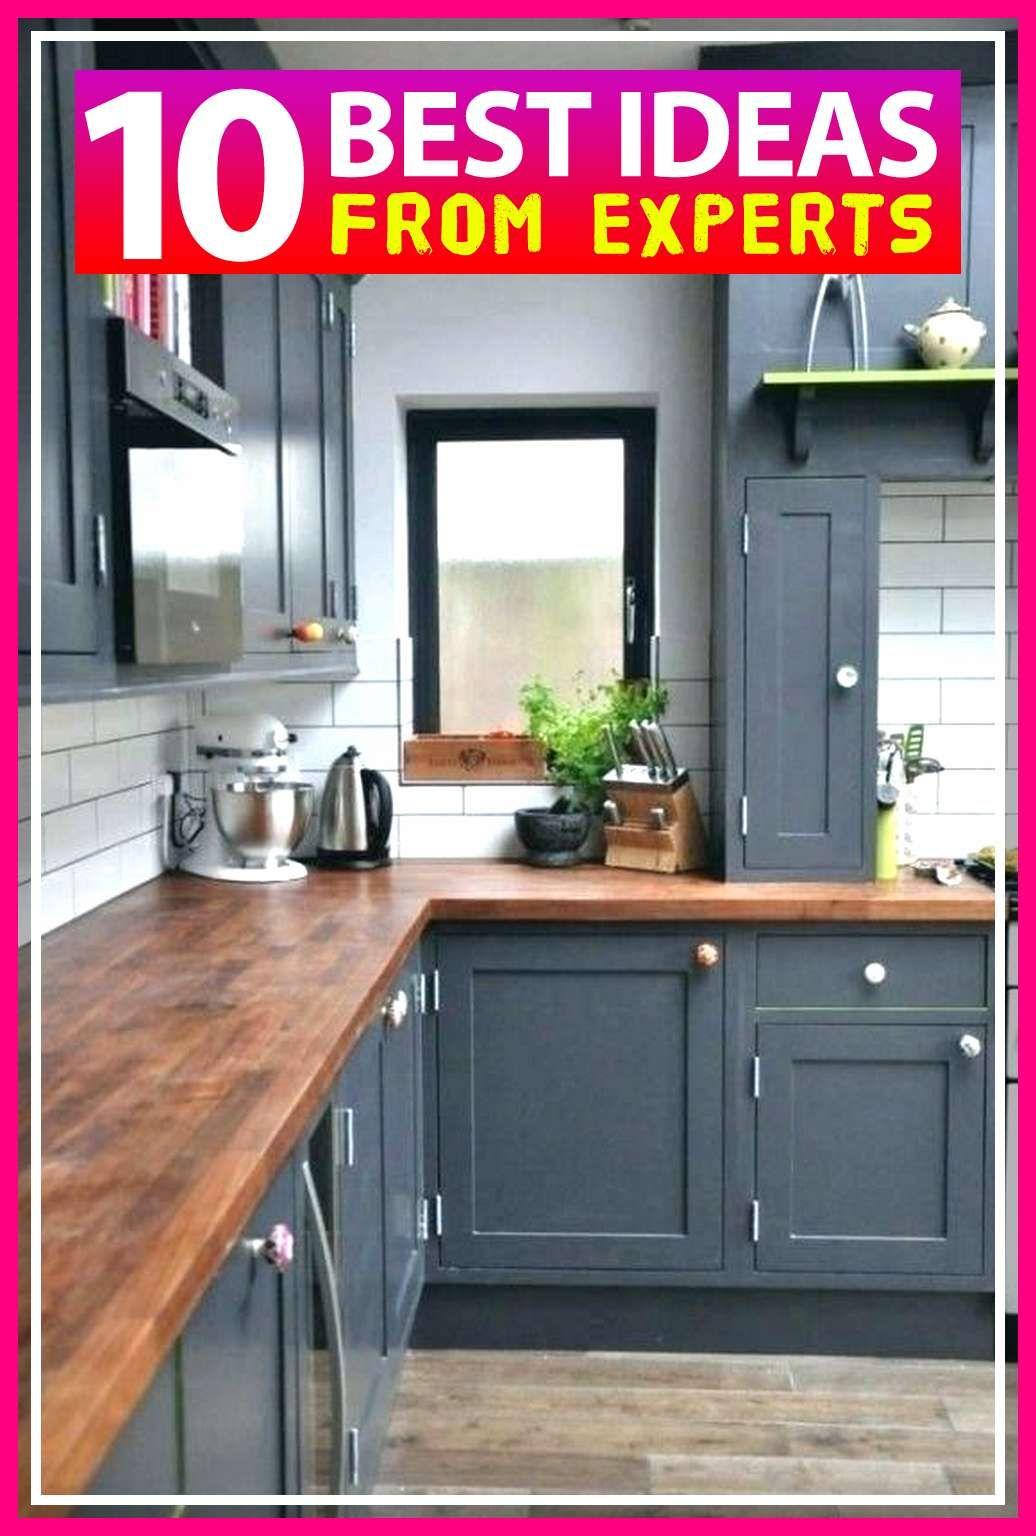 10 Attractive Paint Kitchen Cabinets Diy Ideas Decoracion Painting Kitchen Cabinets Painted Kitchen Cabinets Colors Kitchen Cabinets